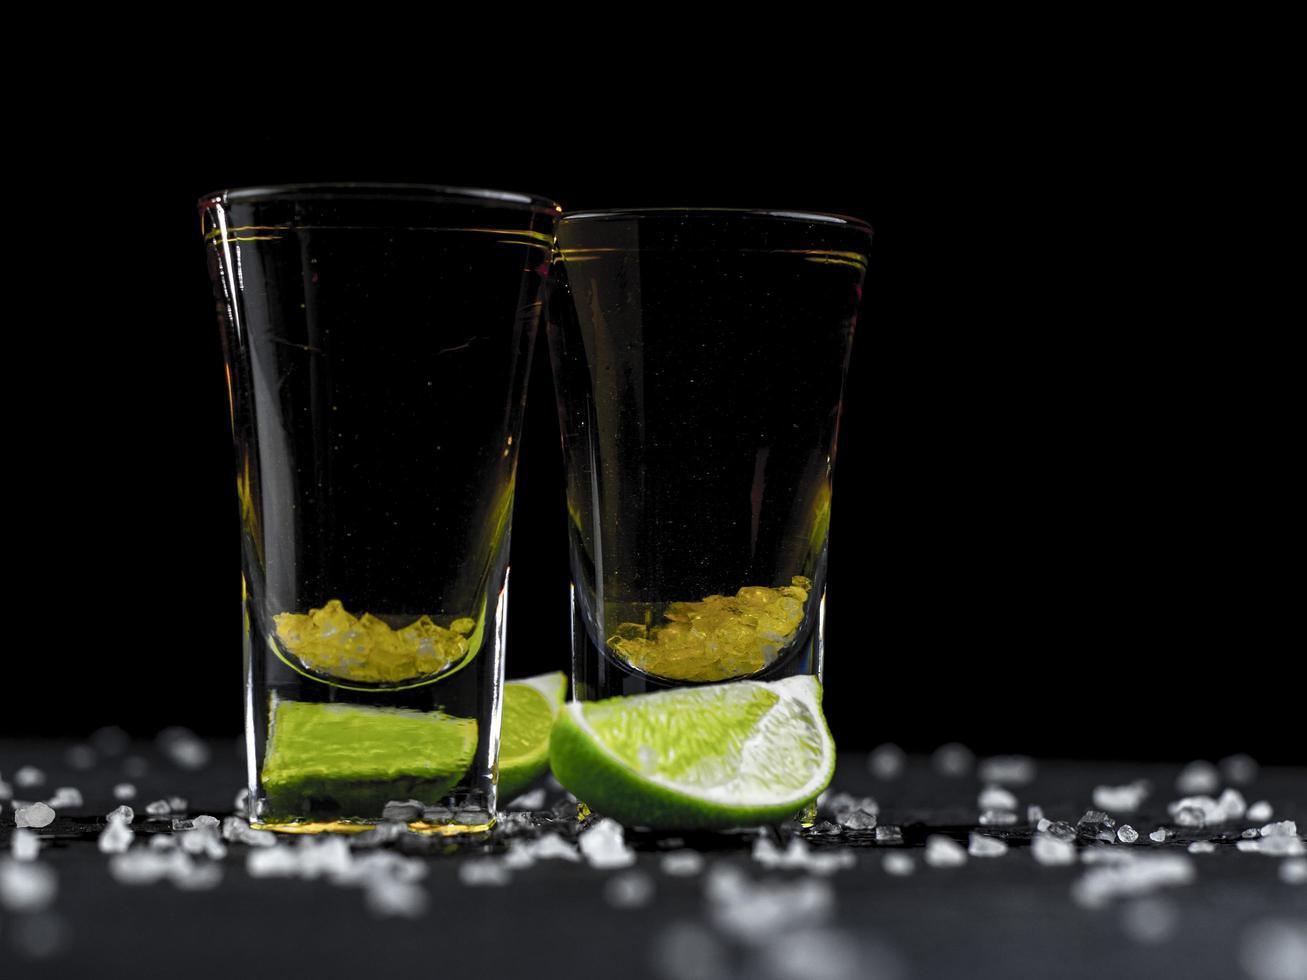 dos tragos de tequila dorado con lima foto